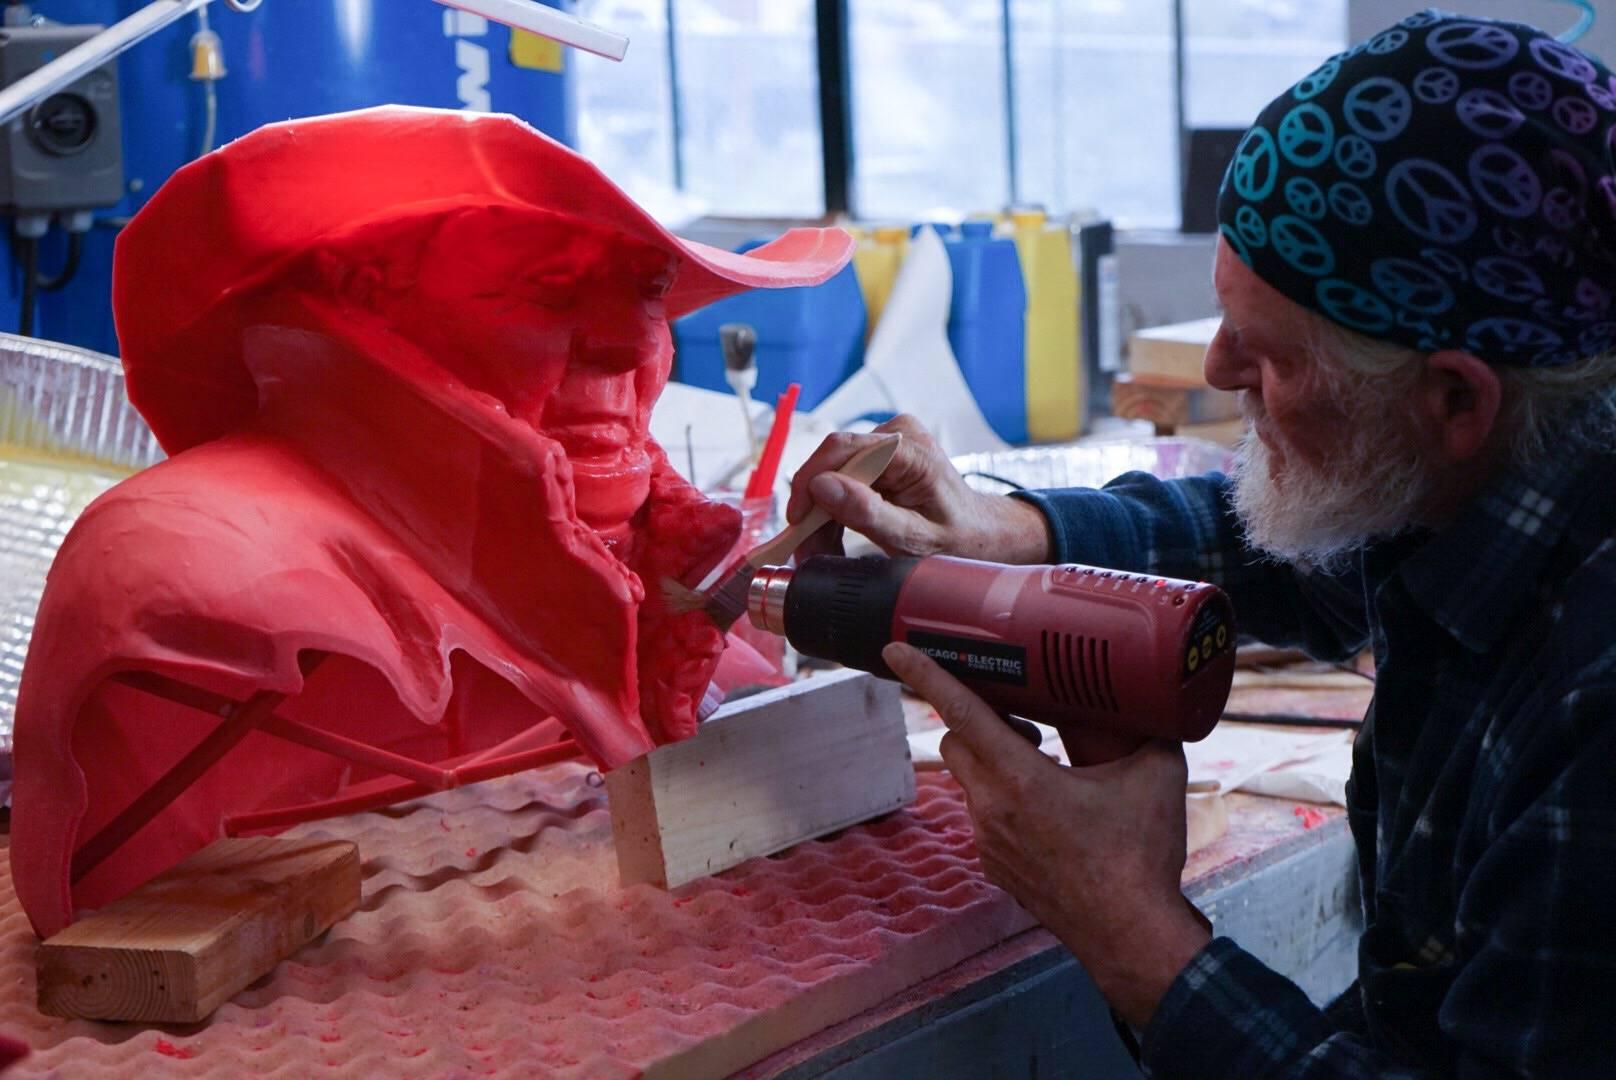 Monumental Sculpture Workshop. Star York. Sorrel Sky Gallery. Artist Workshops. Artist Workshop. Sorrel Sky Workshop. Santa Fe Art Gallery. Santa Fe Workshop. Durango Workshop.